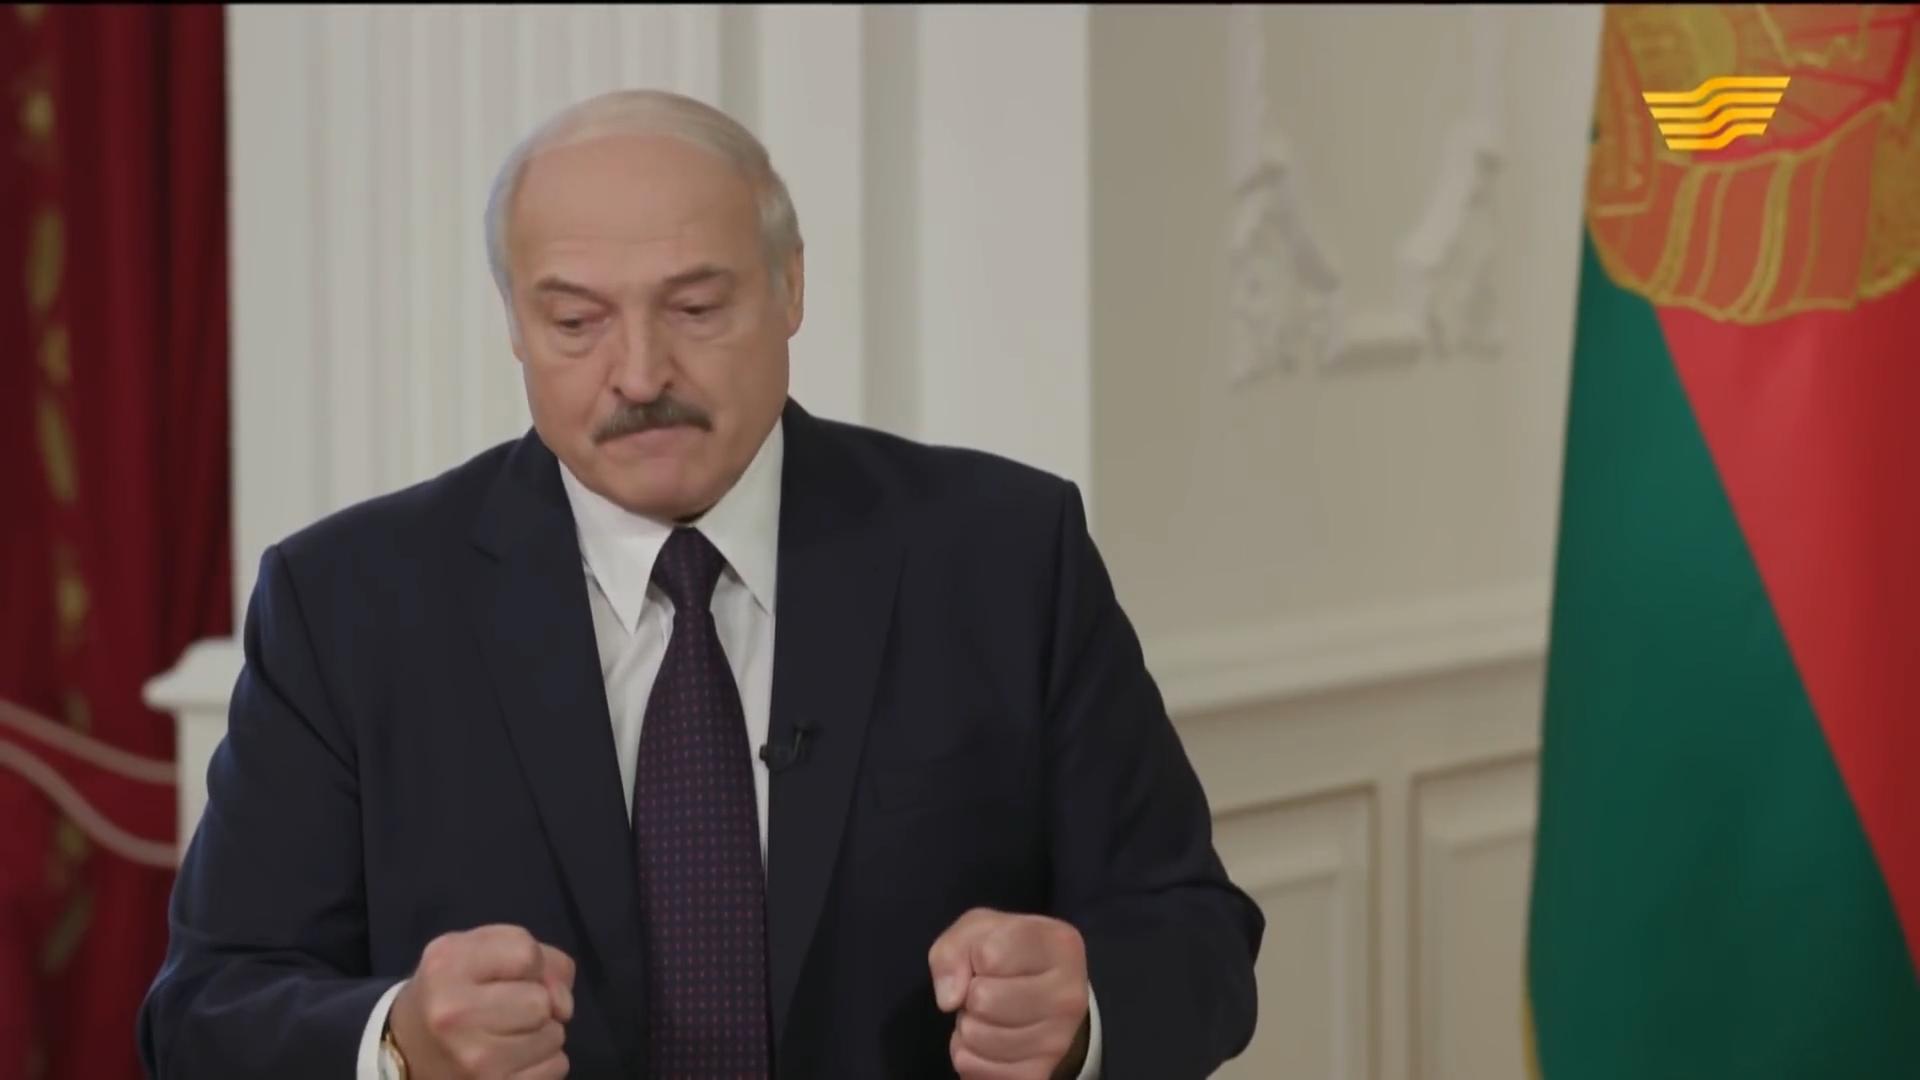 20191022_20-40-Александр Лукашенко дал эксклюзивное интервью телеканалу «Хабар»-scr33